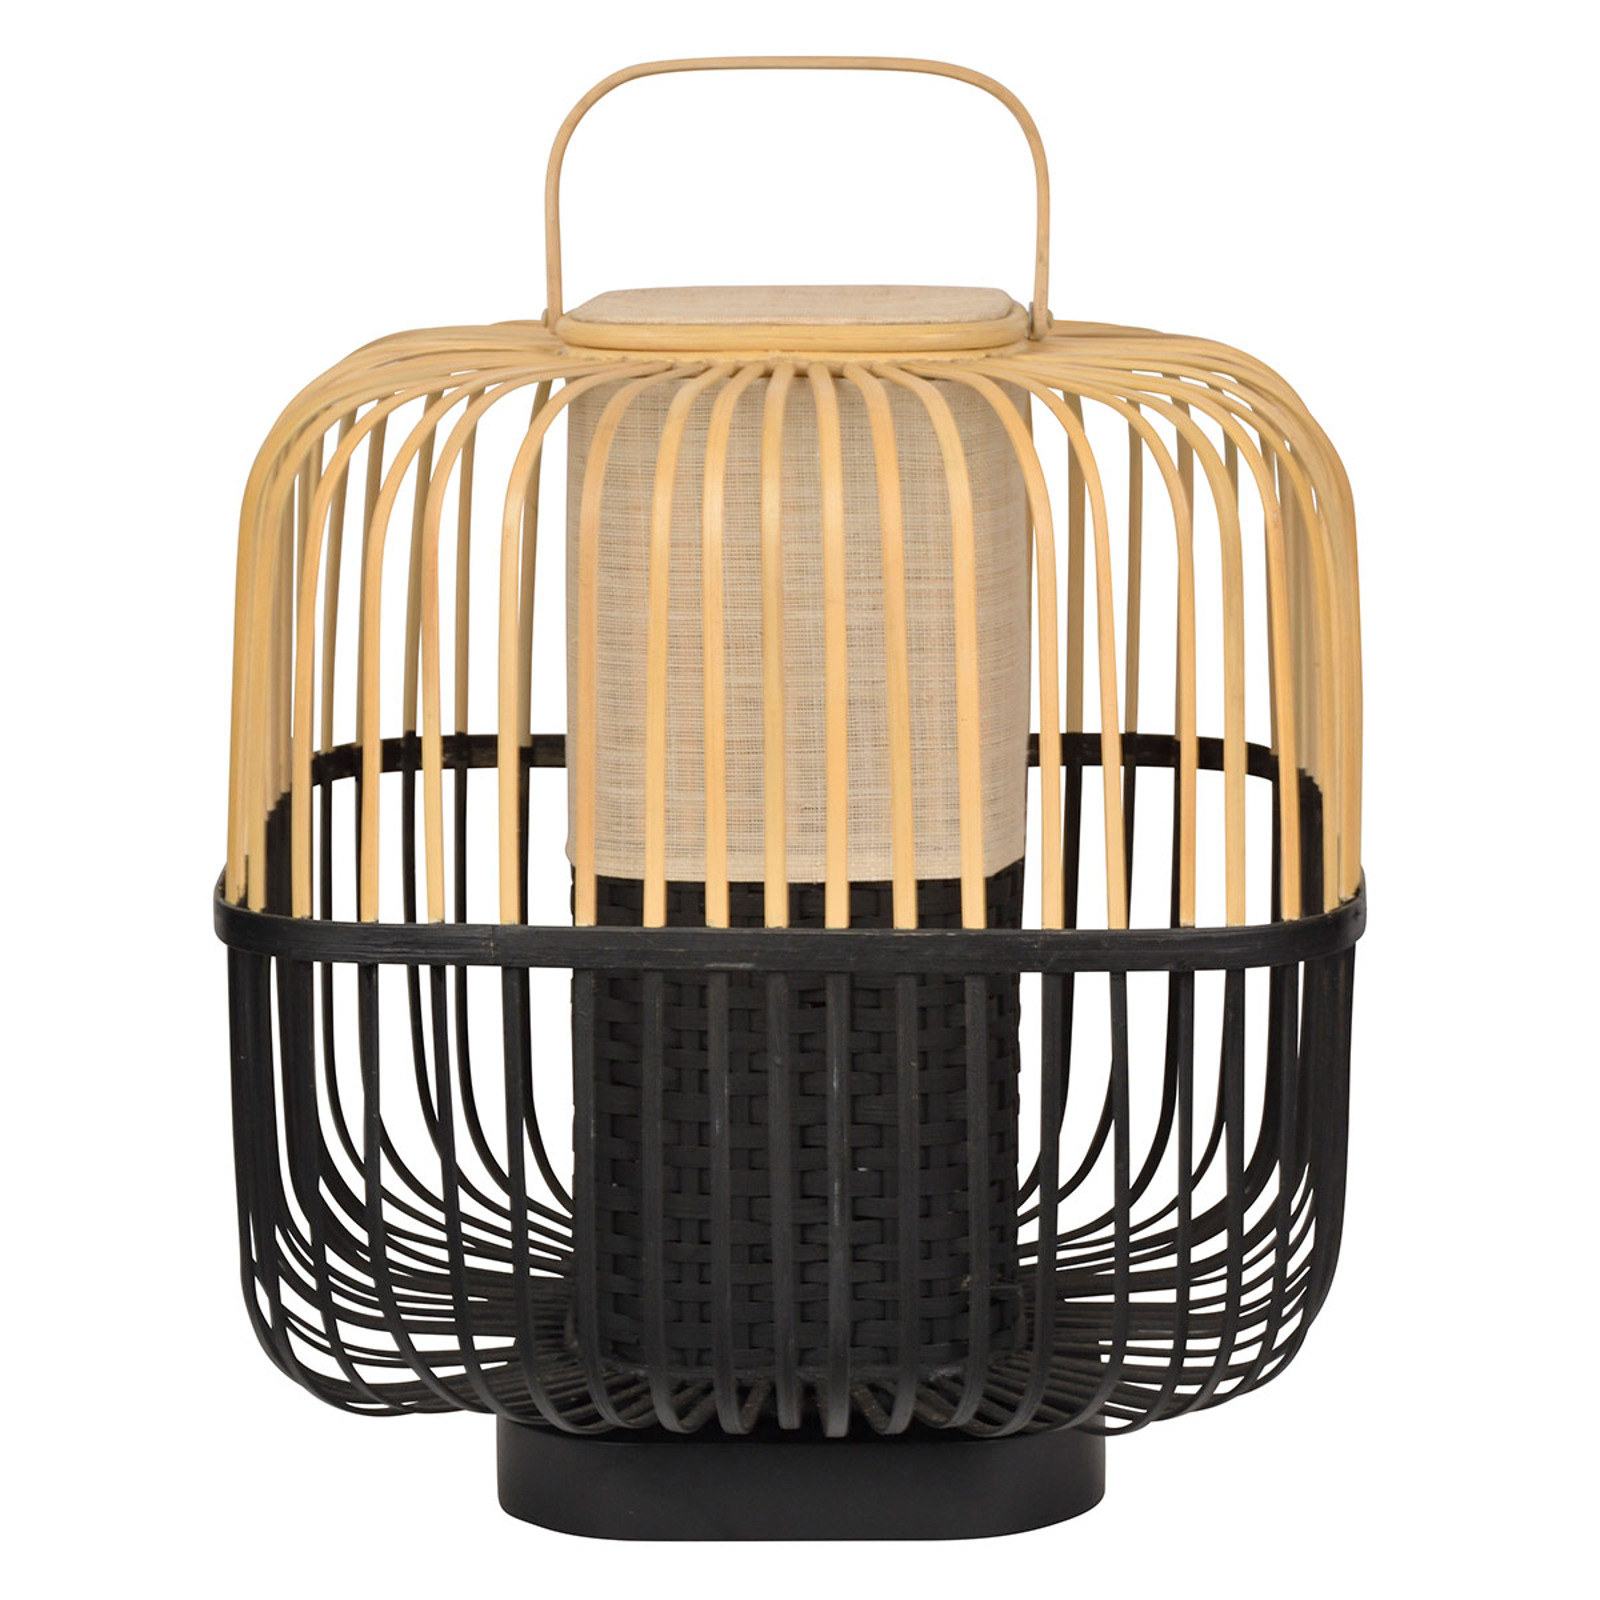 Forestier Bamboo Square M lampe à poser noire